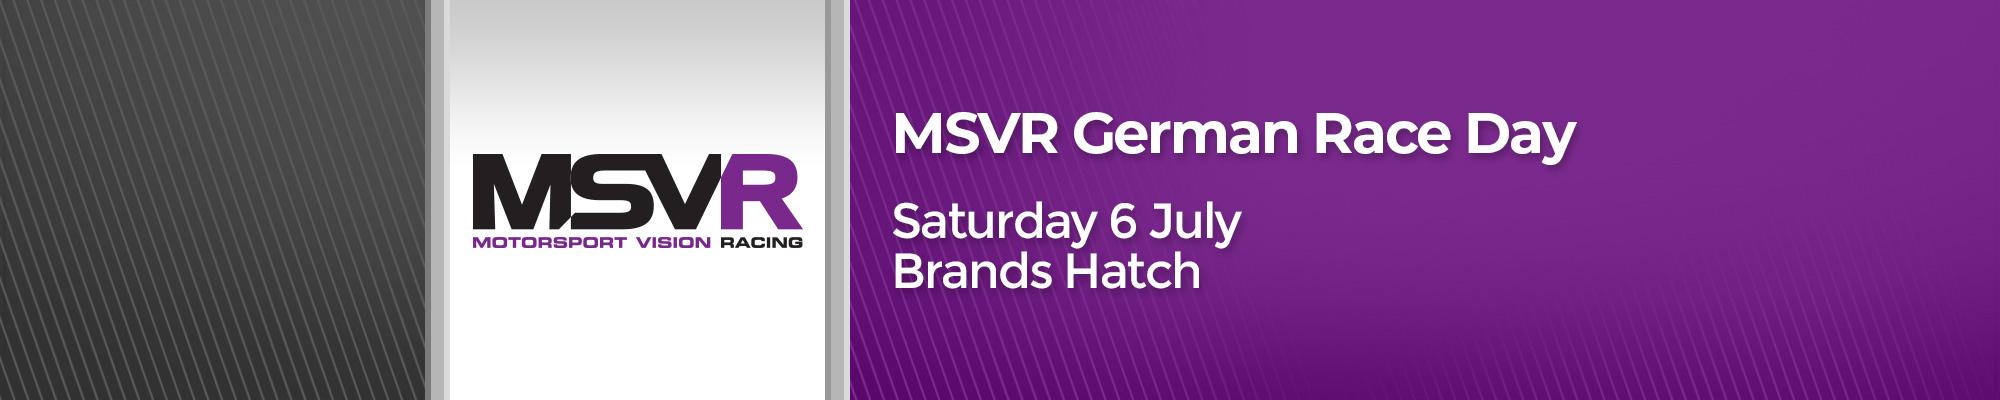 MSVR German Race Day